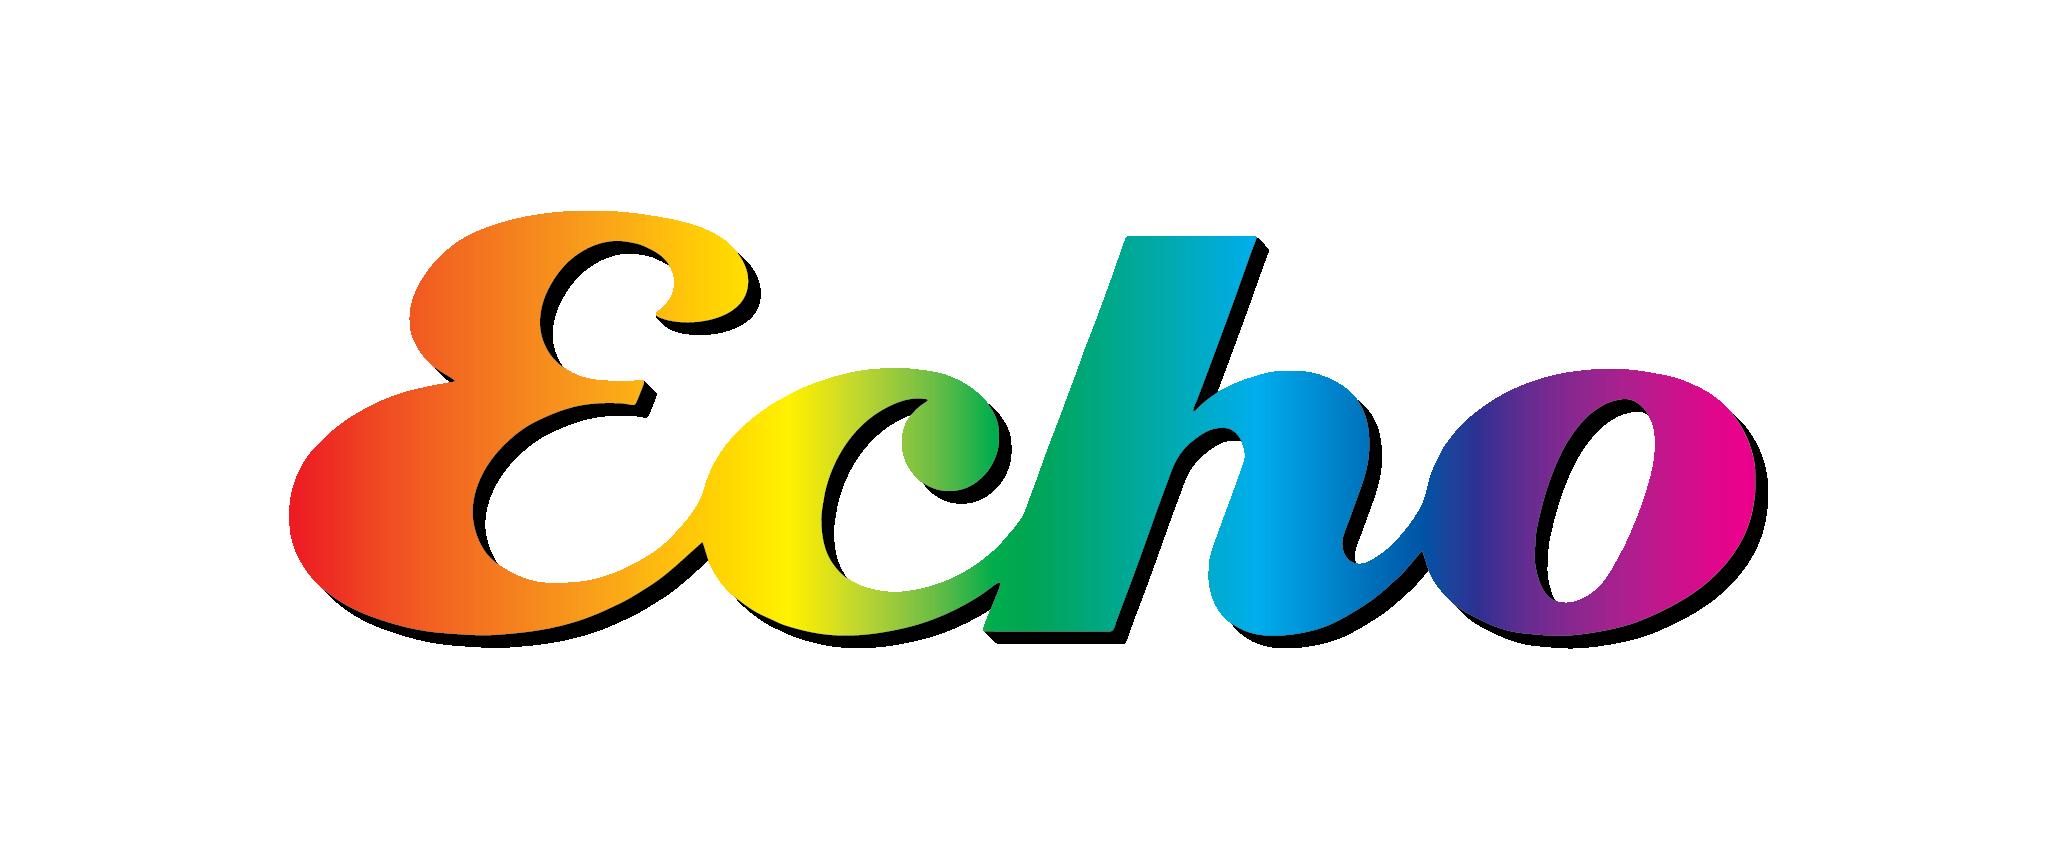 https://byronwritersfestival.com/wp-content/uploads/2021/06/Echo-logo.png